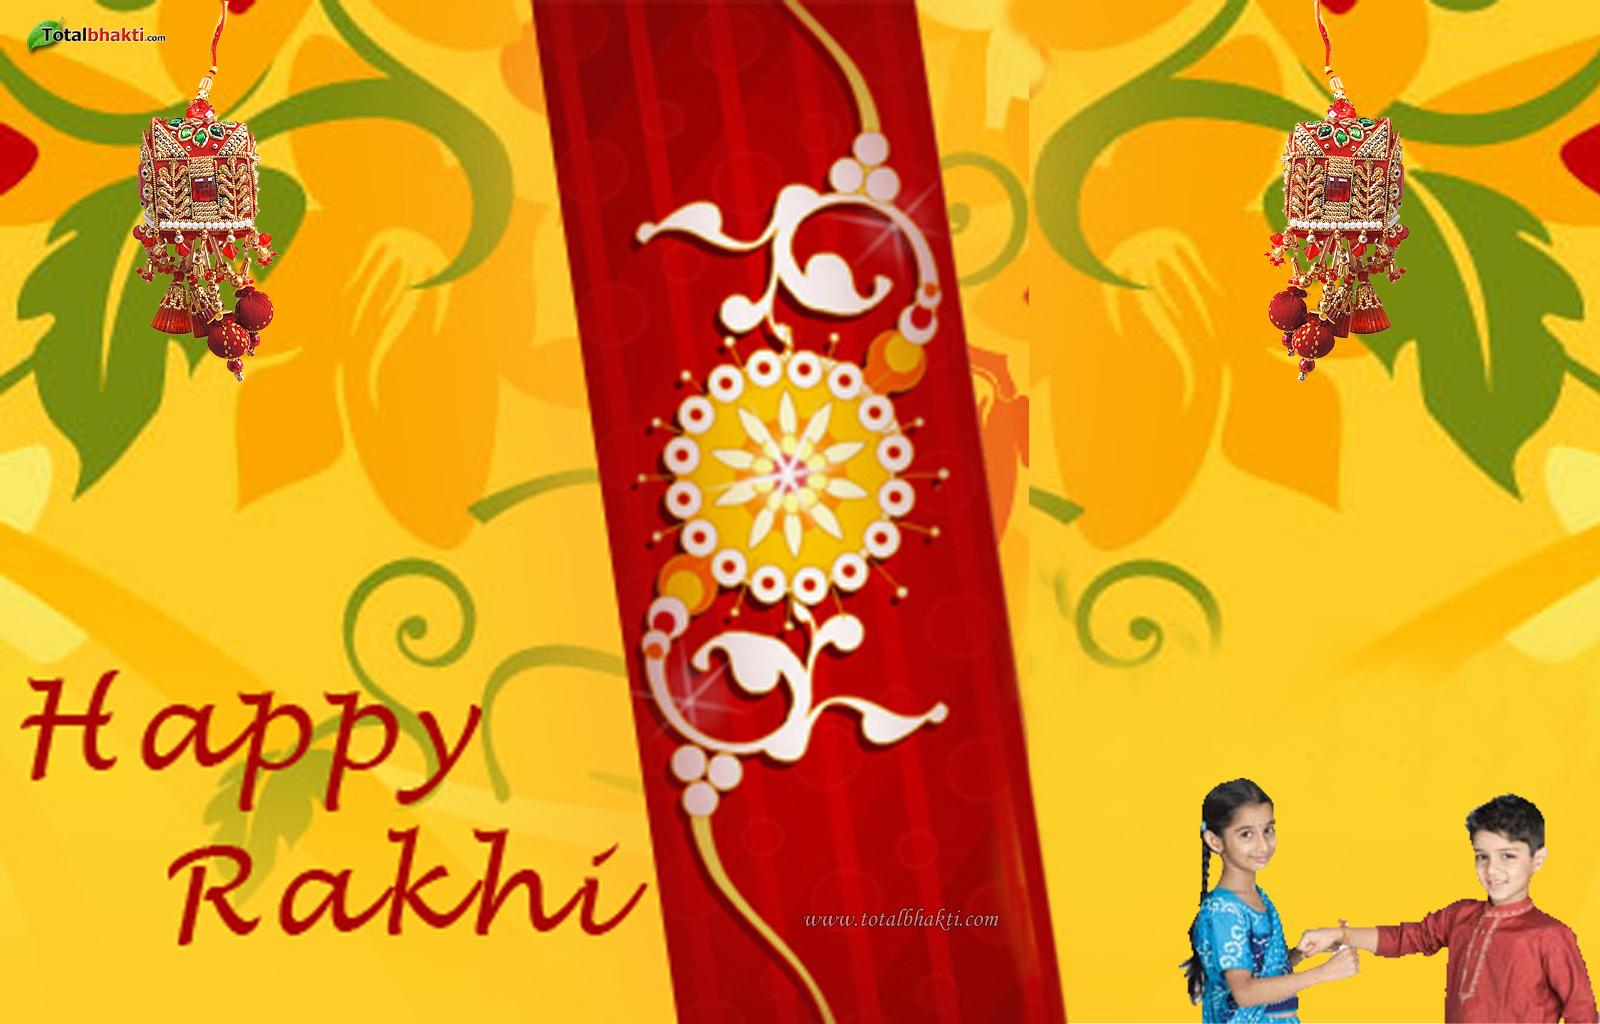 Rakhi 3d Name Wallpaper Sandeep Wallpapers Wallpaper Cave